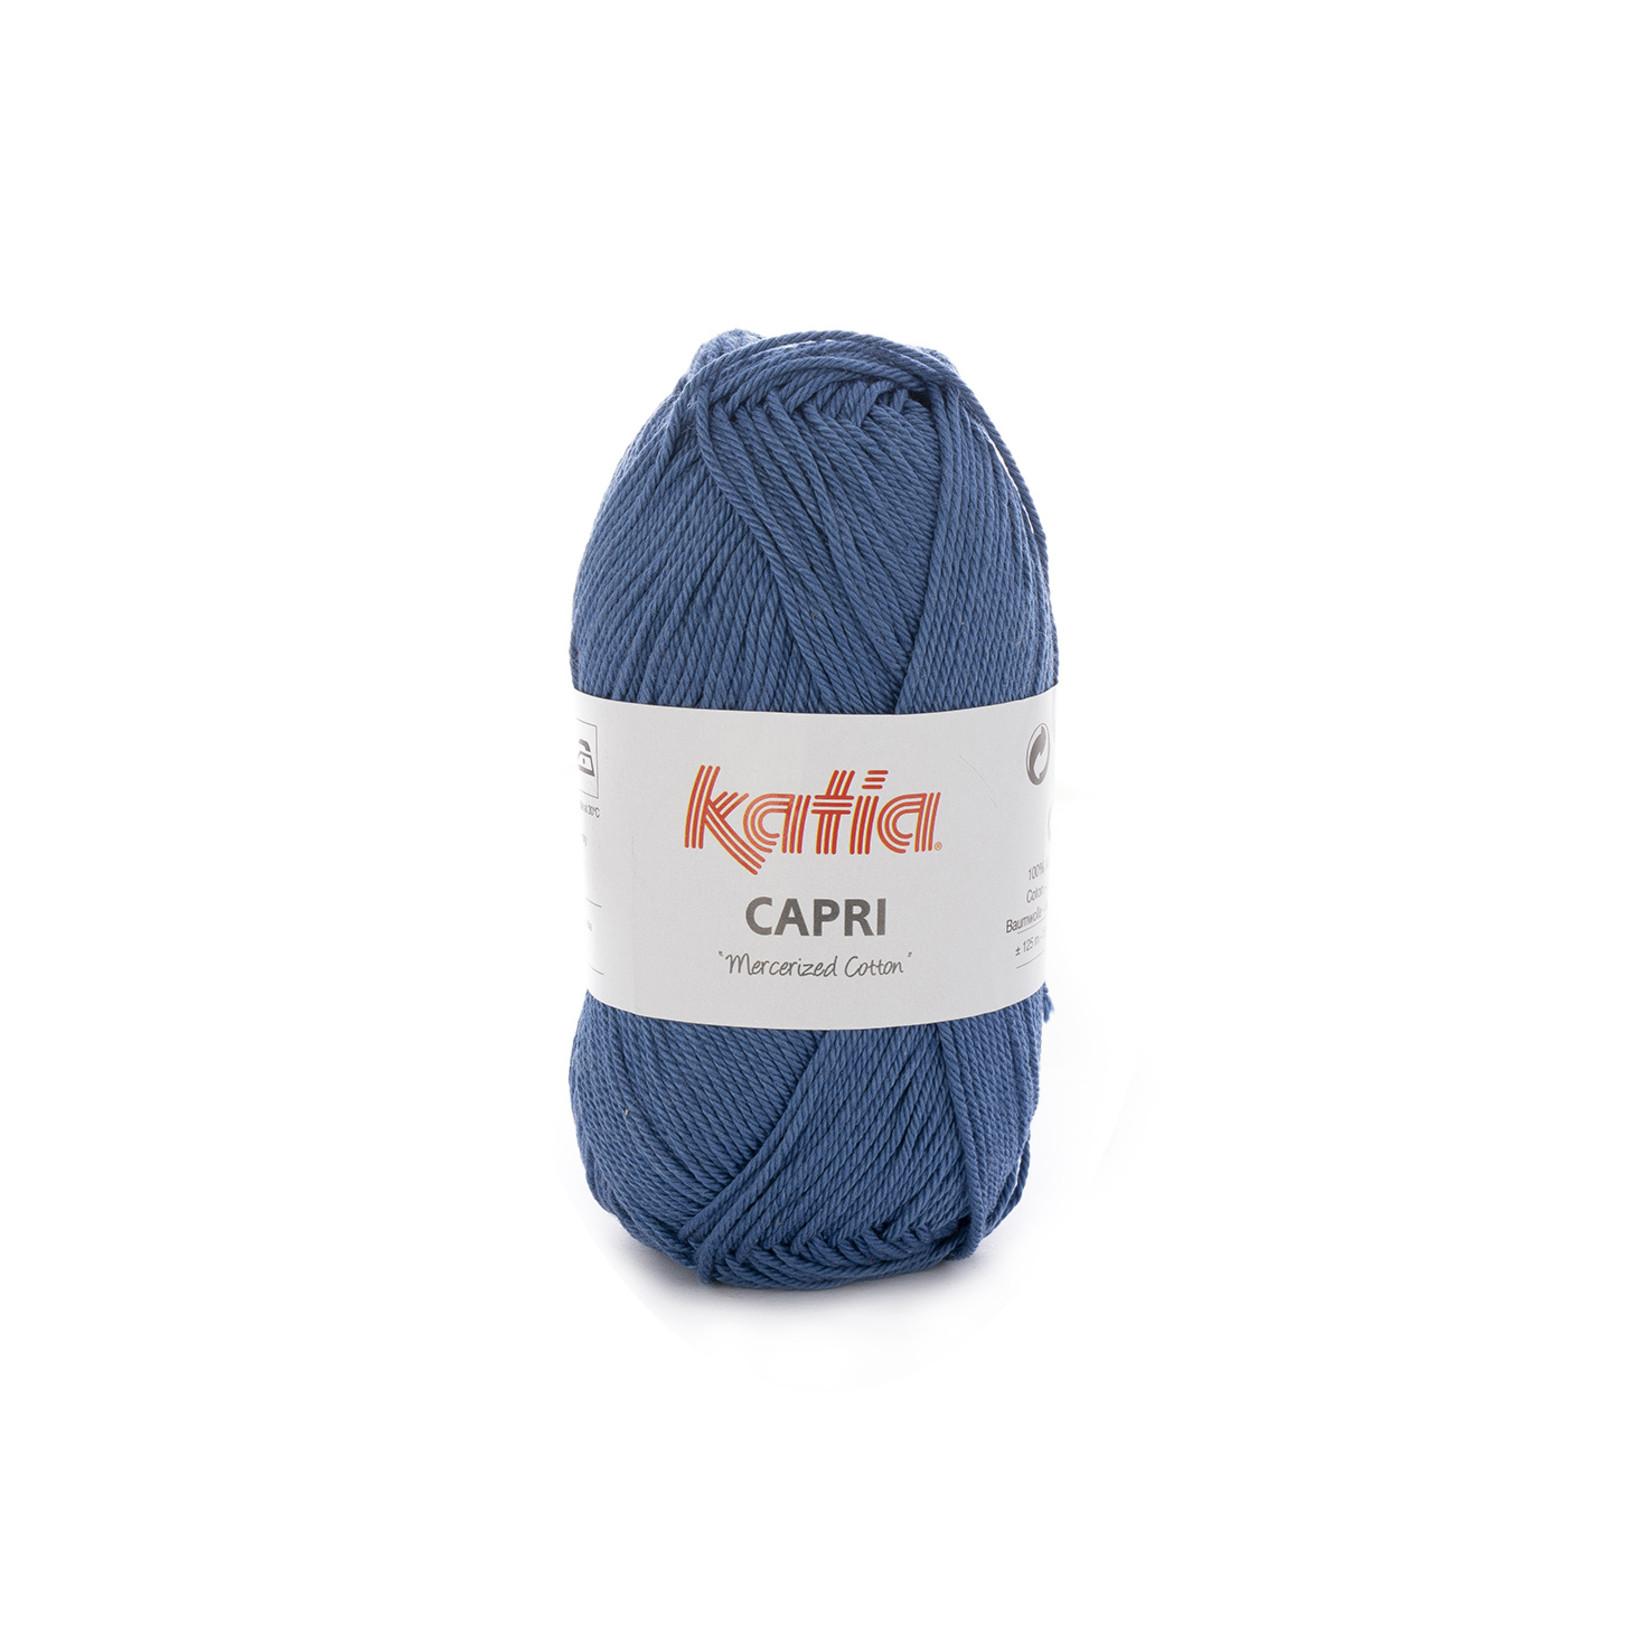 Katia Katia Capri - kleur 155 Medium blauw - 50 gr. = 125 m. - 100% katoen